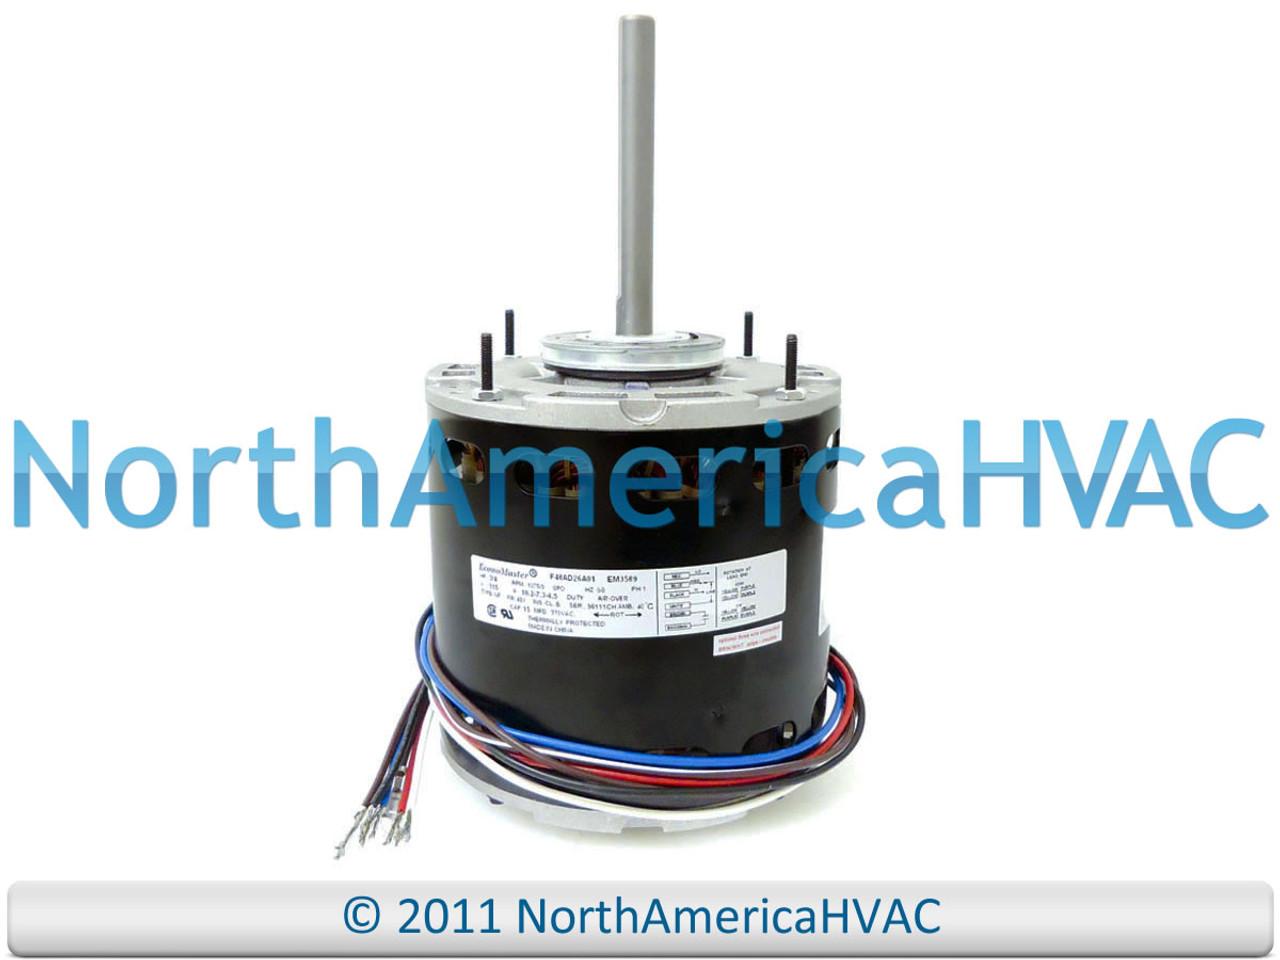 NEW EconoMaster Universal Multi-Speed Furnace BLOWER MOTOR 3/4 HP 115 Volt  - North America HVAC | Hvac Variable Speed Blower Wiring |  | North America HVAC